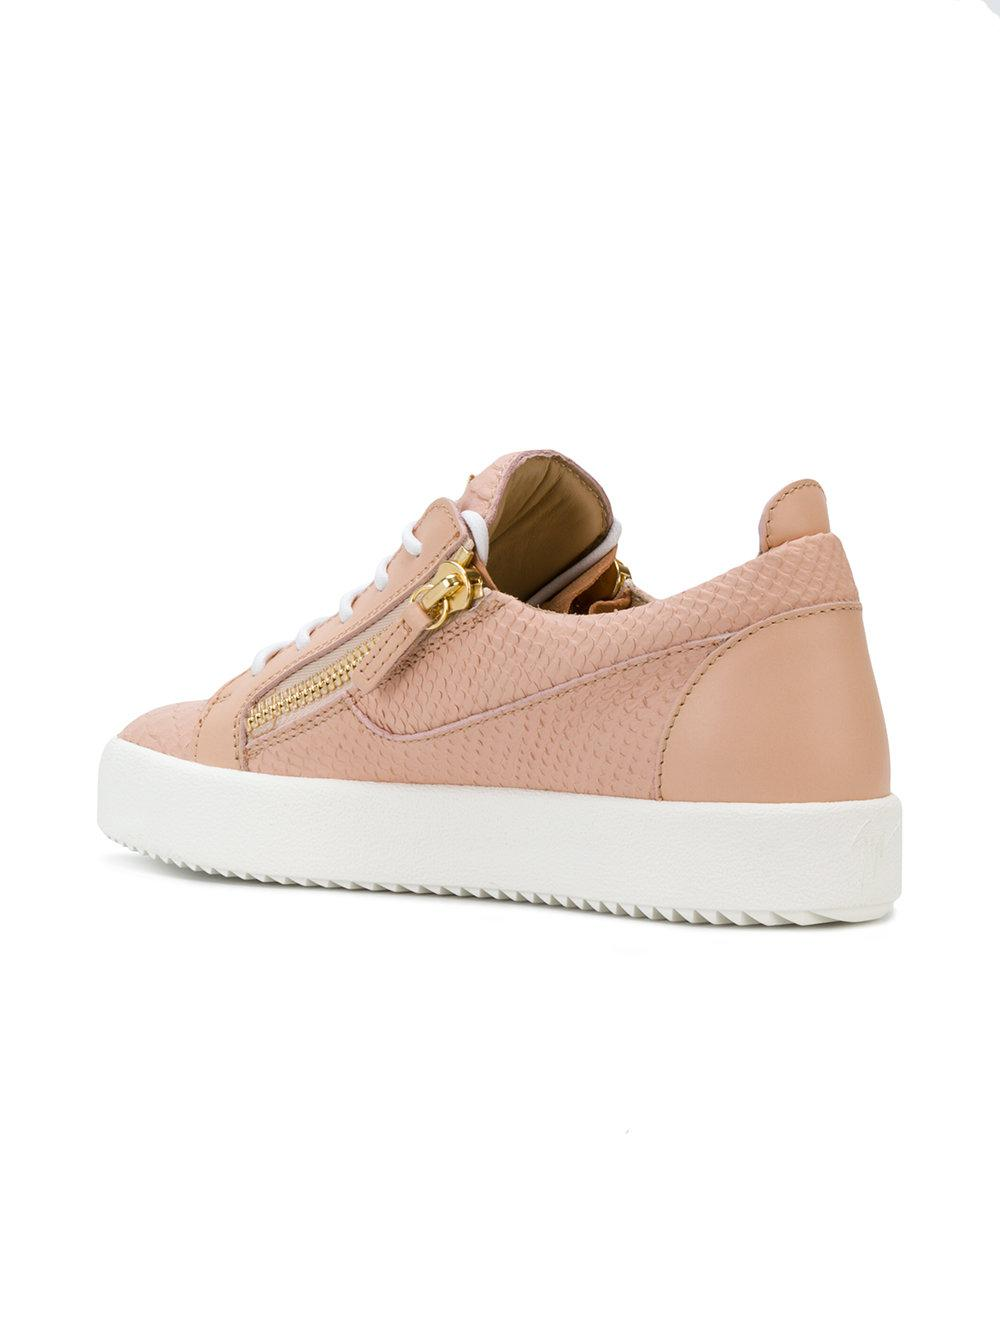 Nicki python printed sneakers - Pink & Purple Giuseppe Zanotti hpysavwn